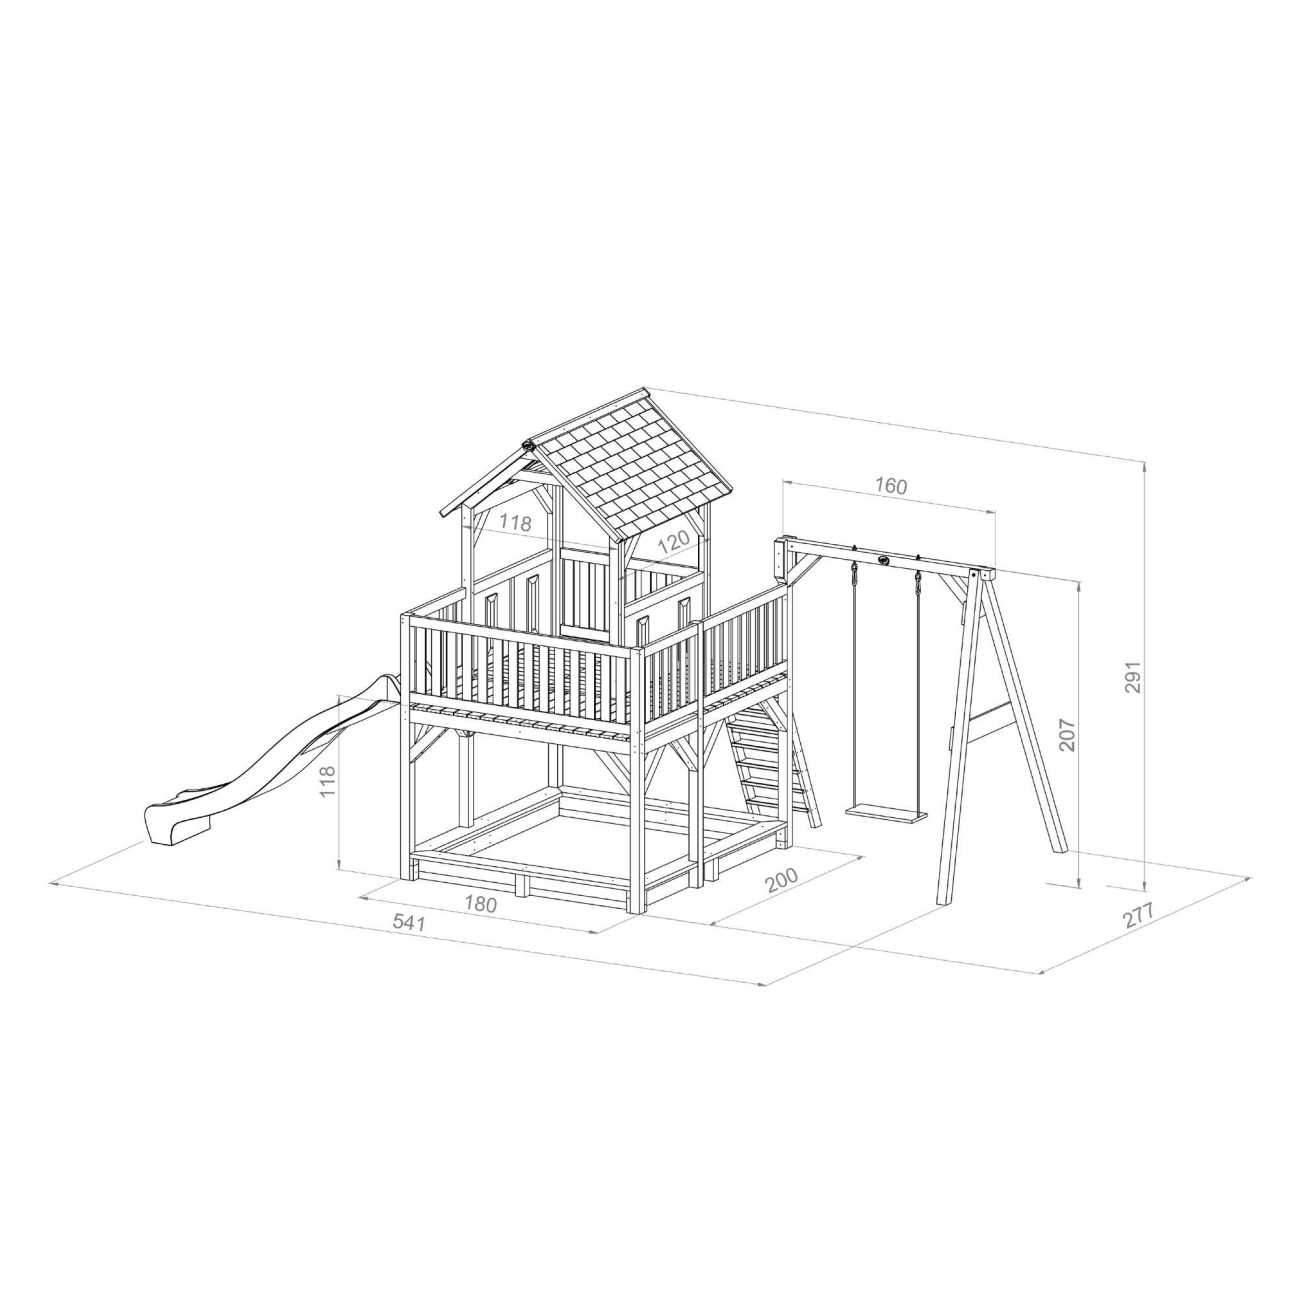 Kinder Holzhaus Garten Reizend Kinder Spielturm Axi atka Rutsche 2 30 M 1 Schaukel